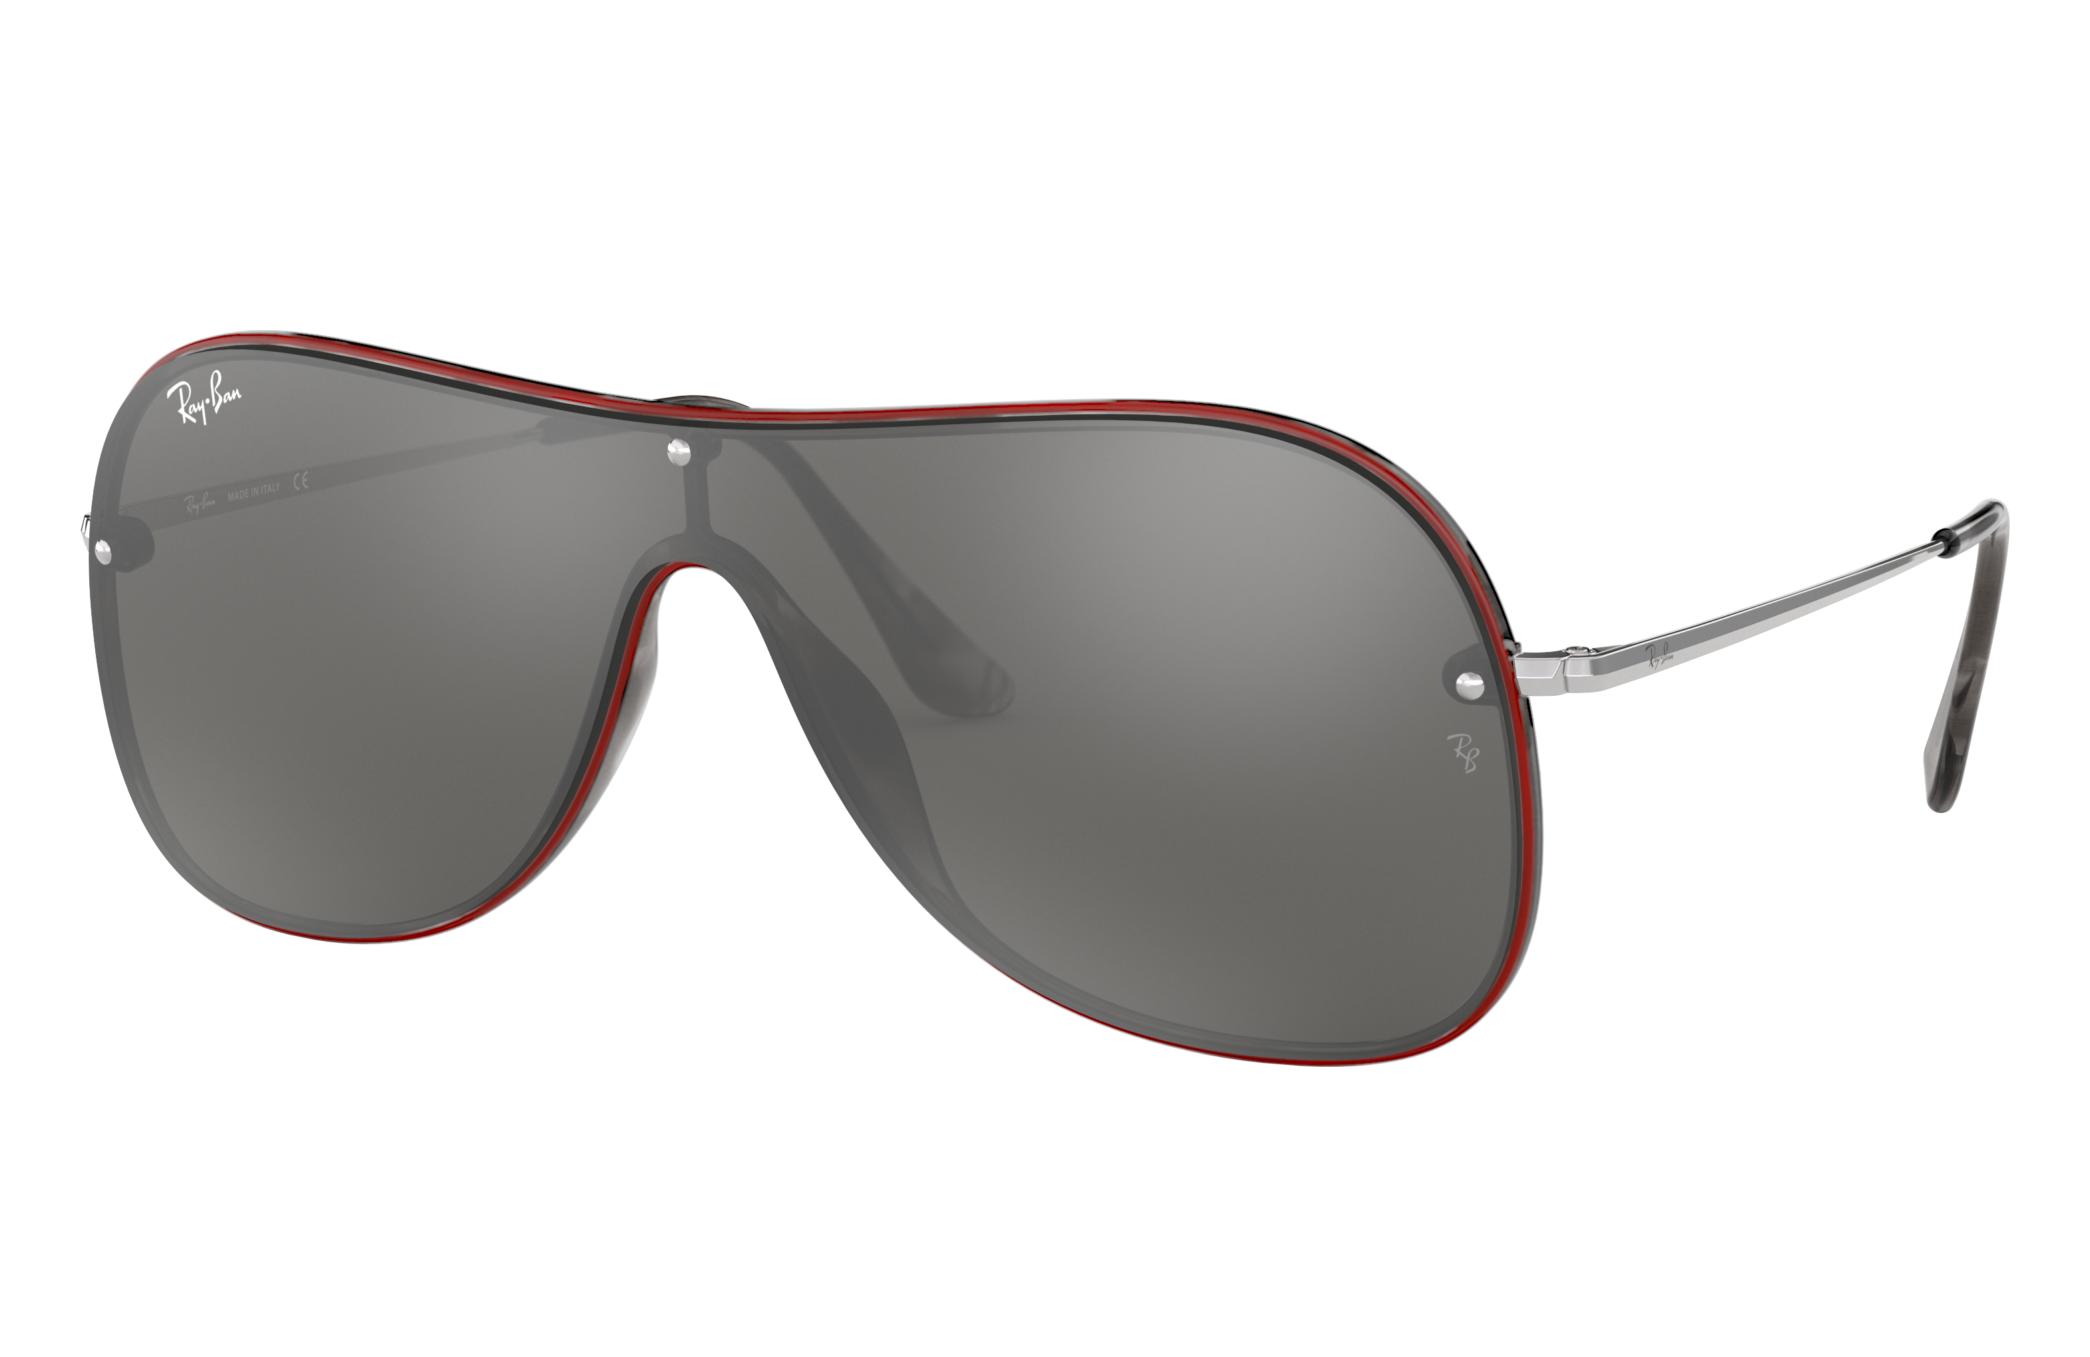 Ray-Ban Rb4311n Silver, Gray Lenses - RB4311N